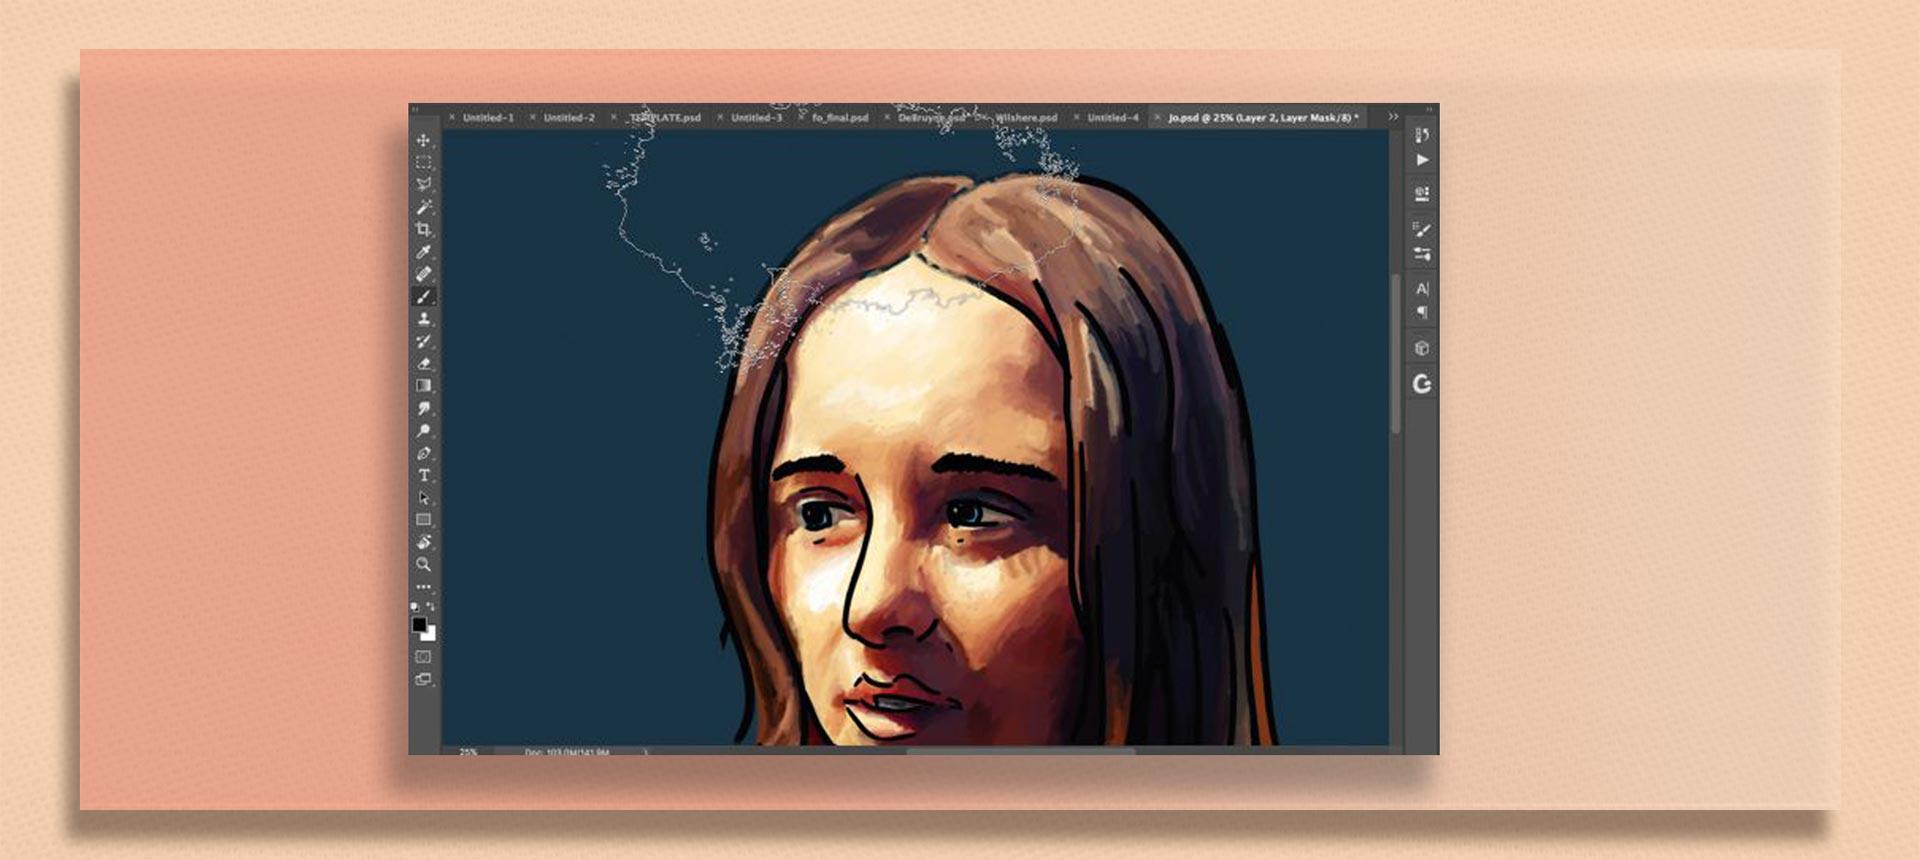 brush tool  photoshop7 - چگونه از ابزار براش در فتوشاپ استفاده کنیم